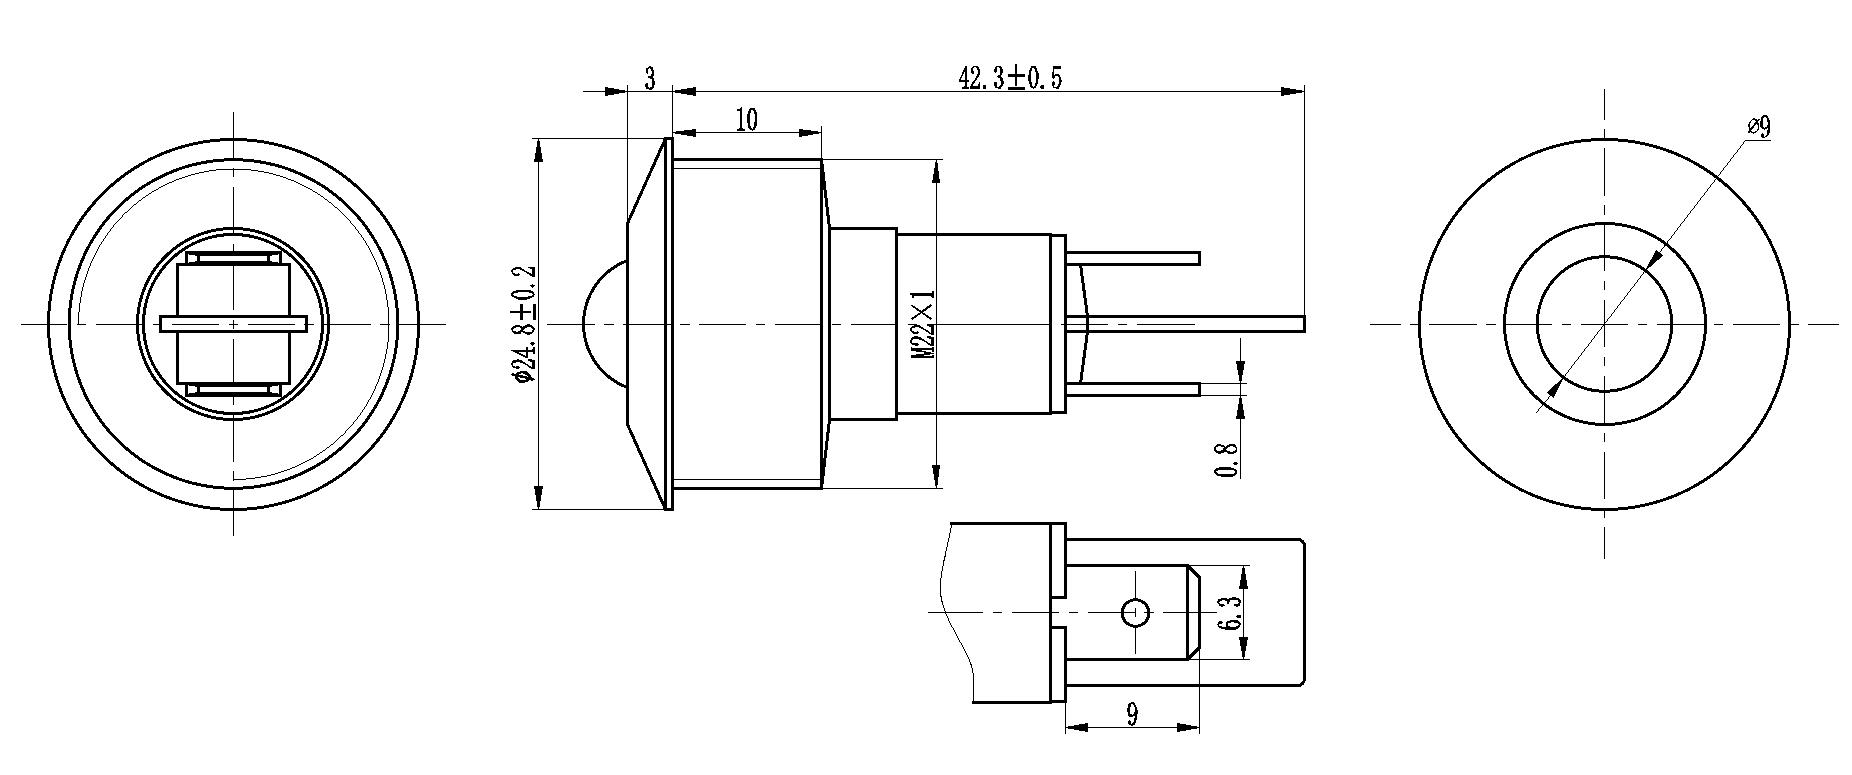 22mm 110v power box metal indicator light